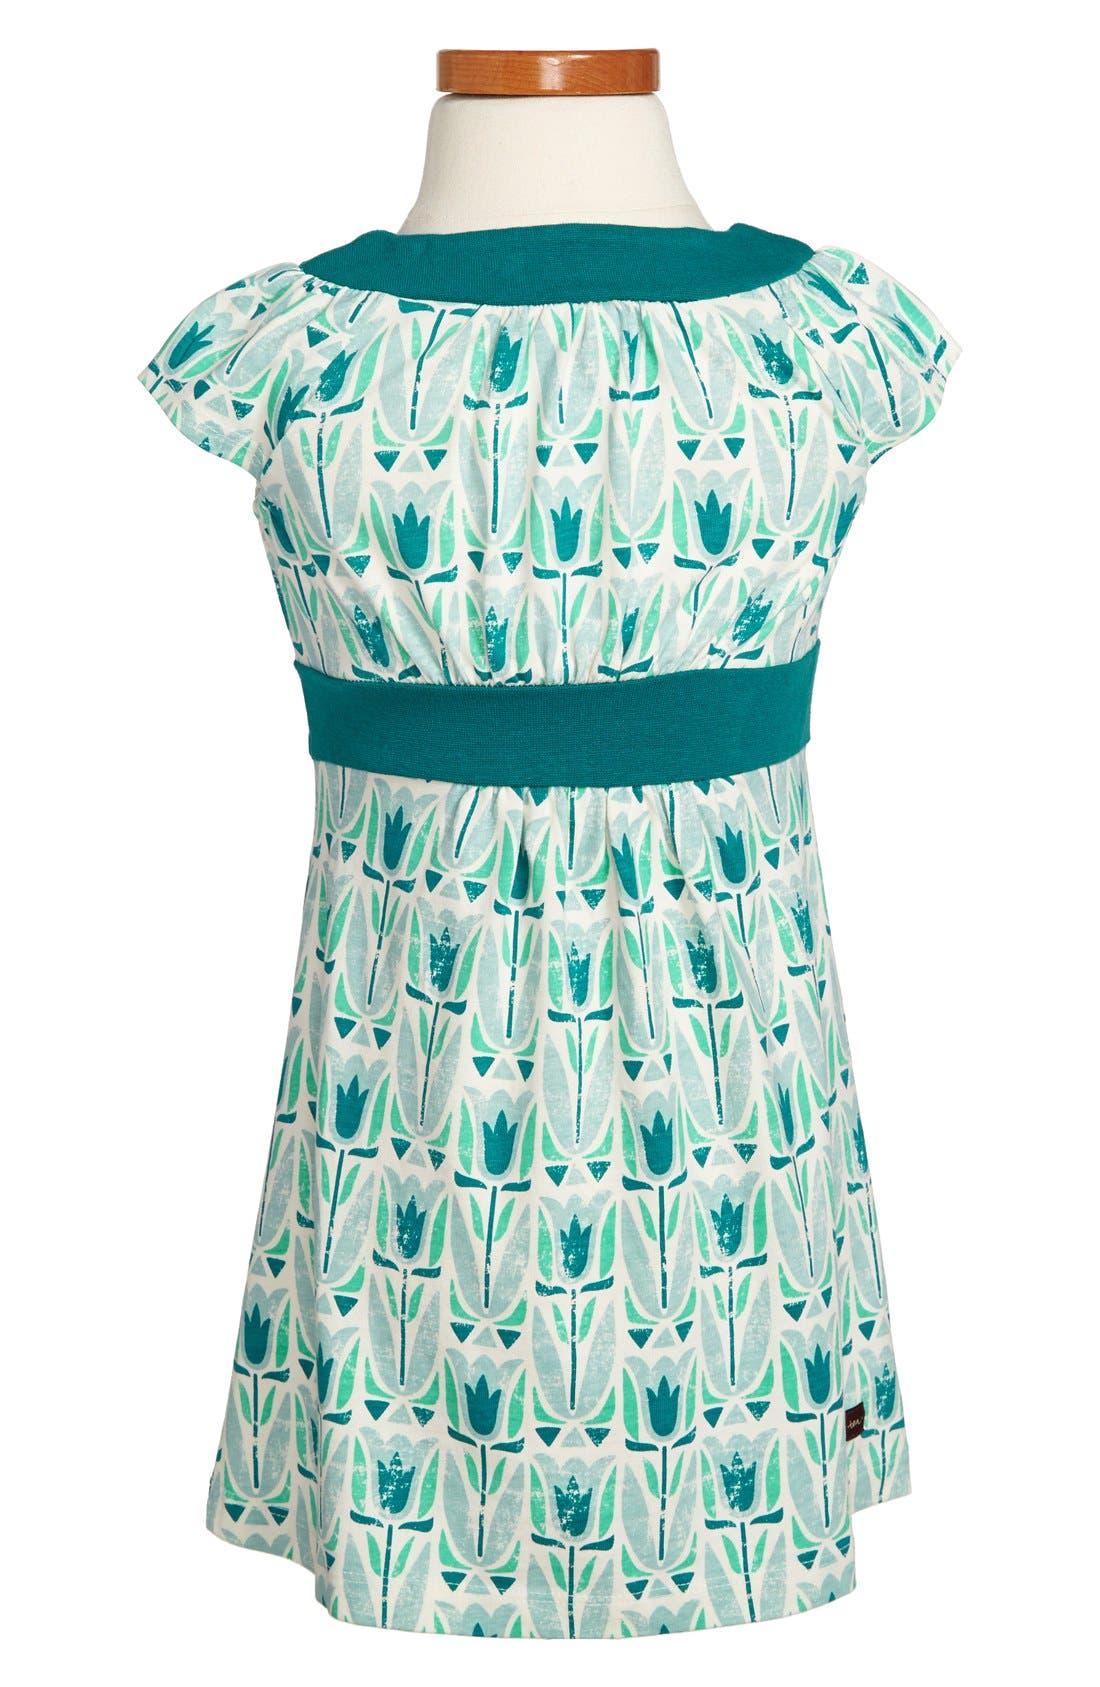 Alternate Image 2  - Tea Collection 'Mod Tulip' Dress (Toddler Girls, Little Girls & Big Girls)